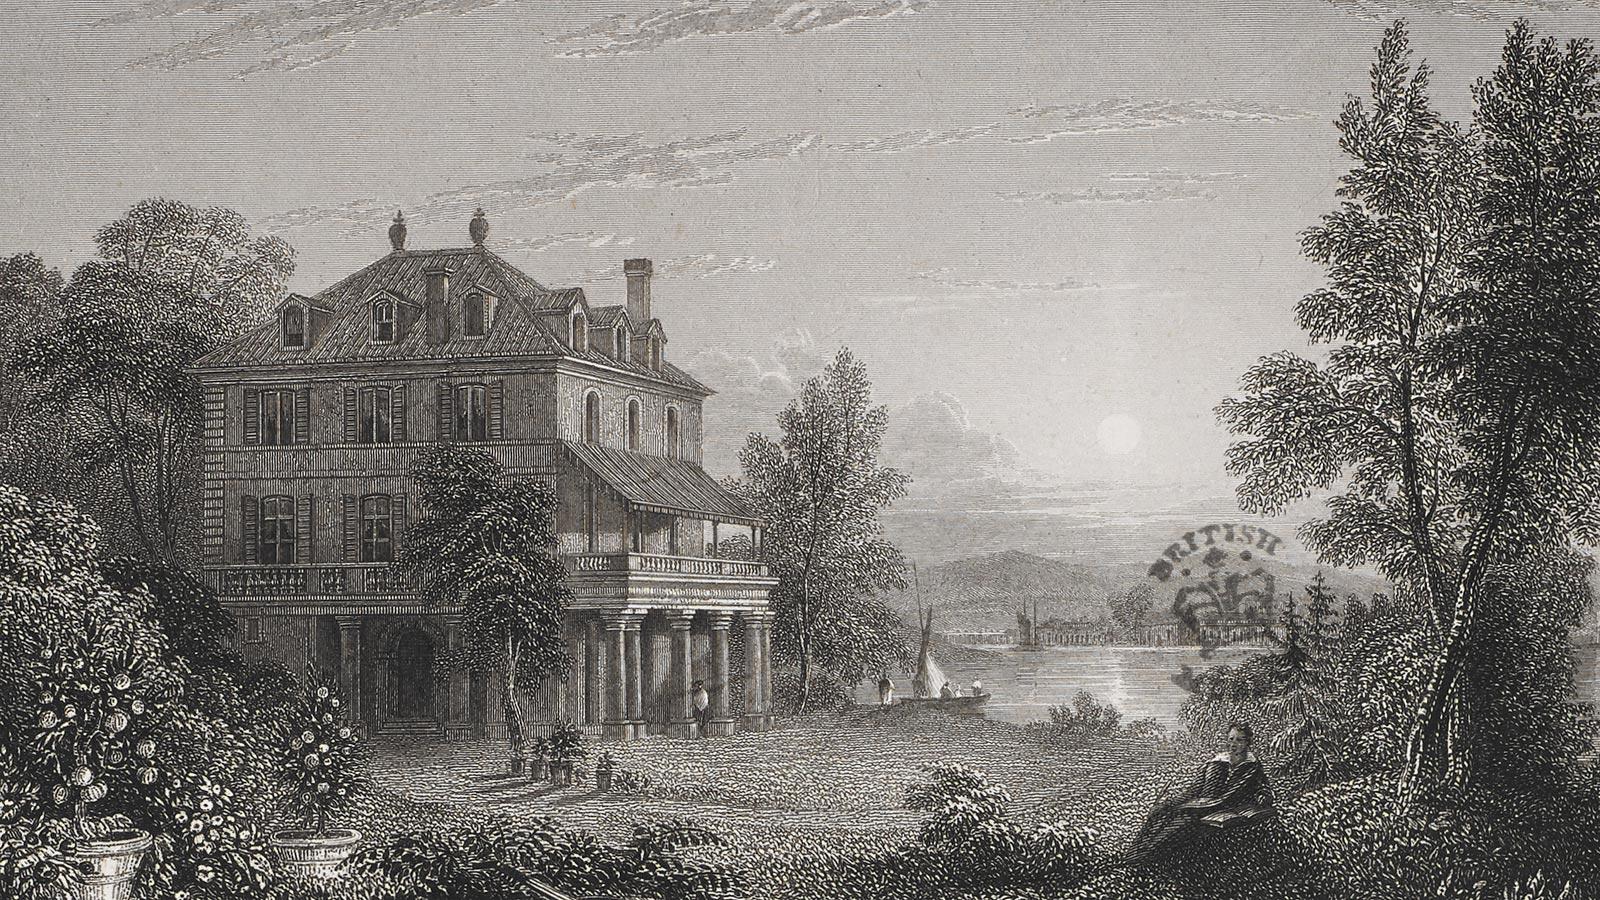 Mary Shelley, Frankenstein and the Villa Diodati